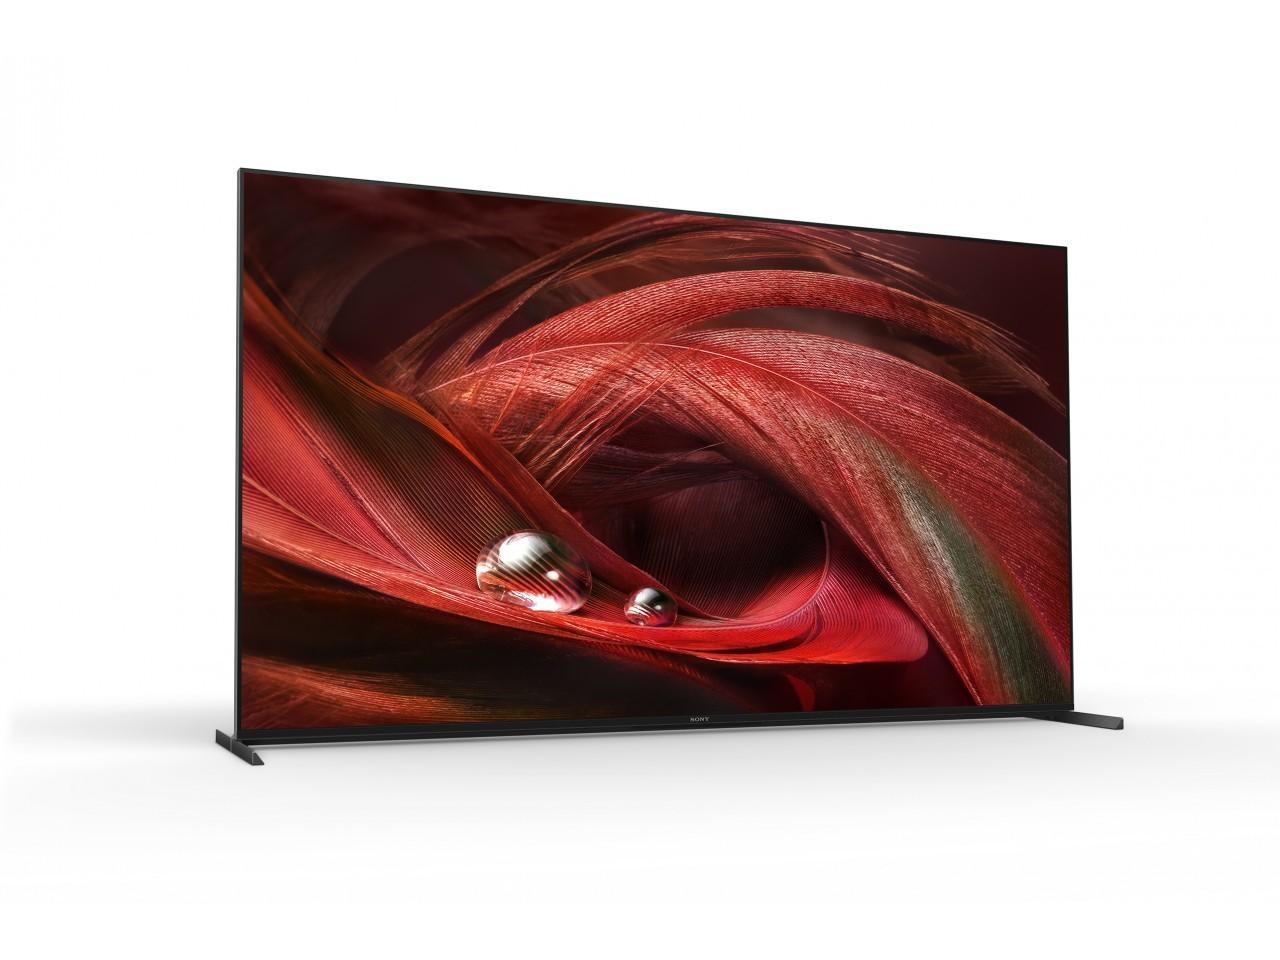 Телевизор XR-75X95J купить в интернет-магазине Sony Centre